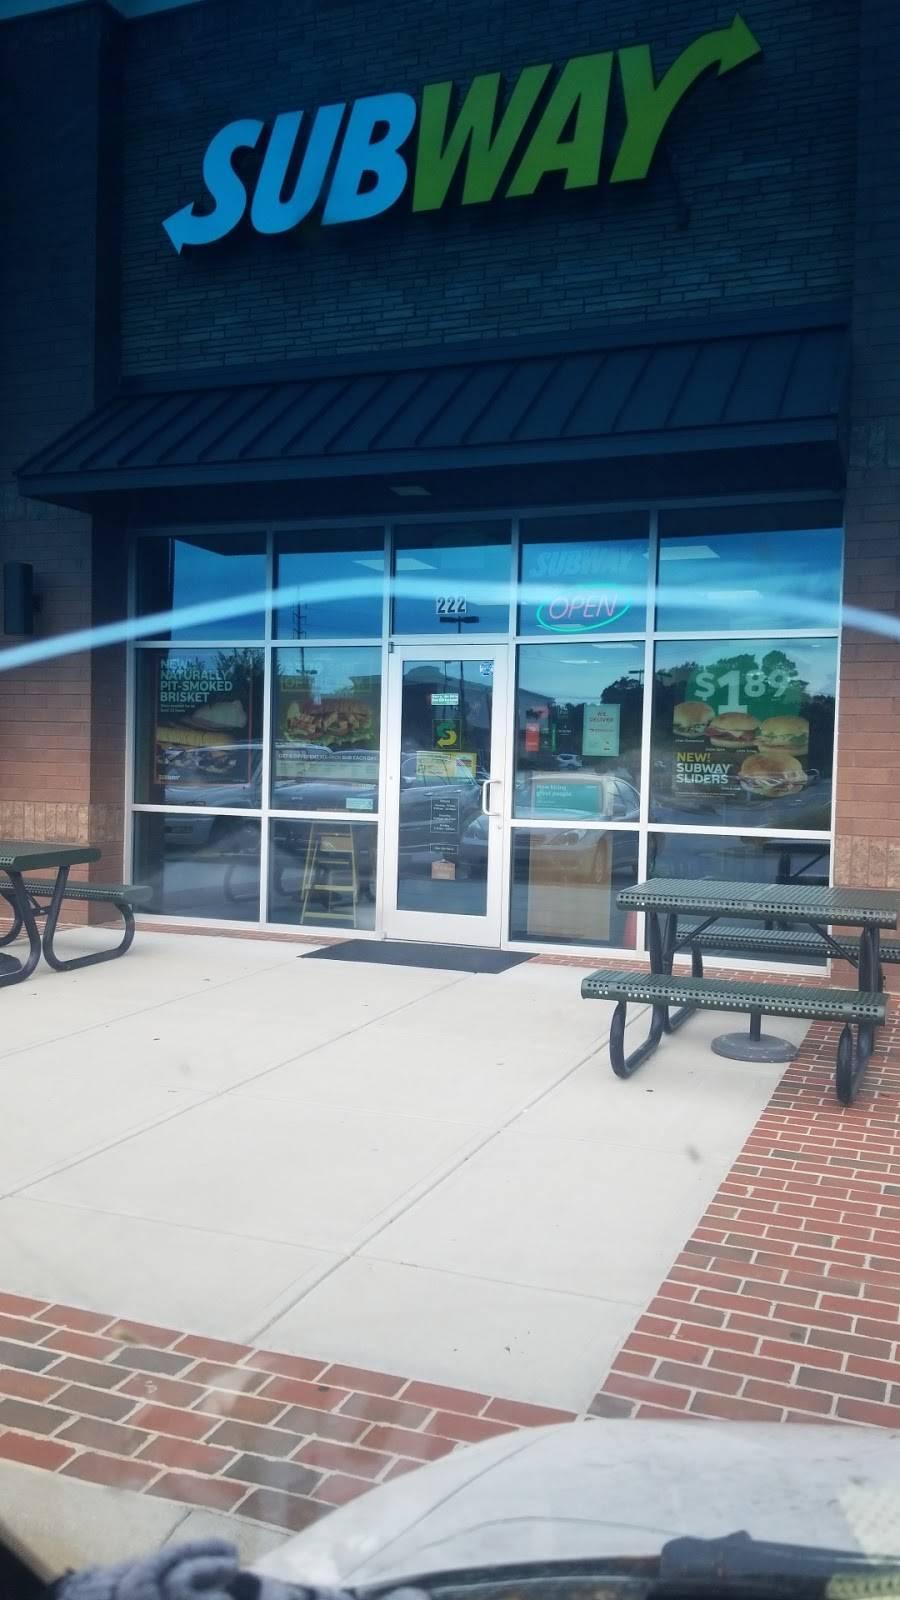 Subway   restaurant   222 Harvey St, Winston-Salem, NC 27103, USA   3363069613 OR +1 336-306-9613